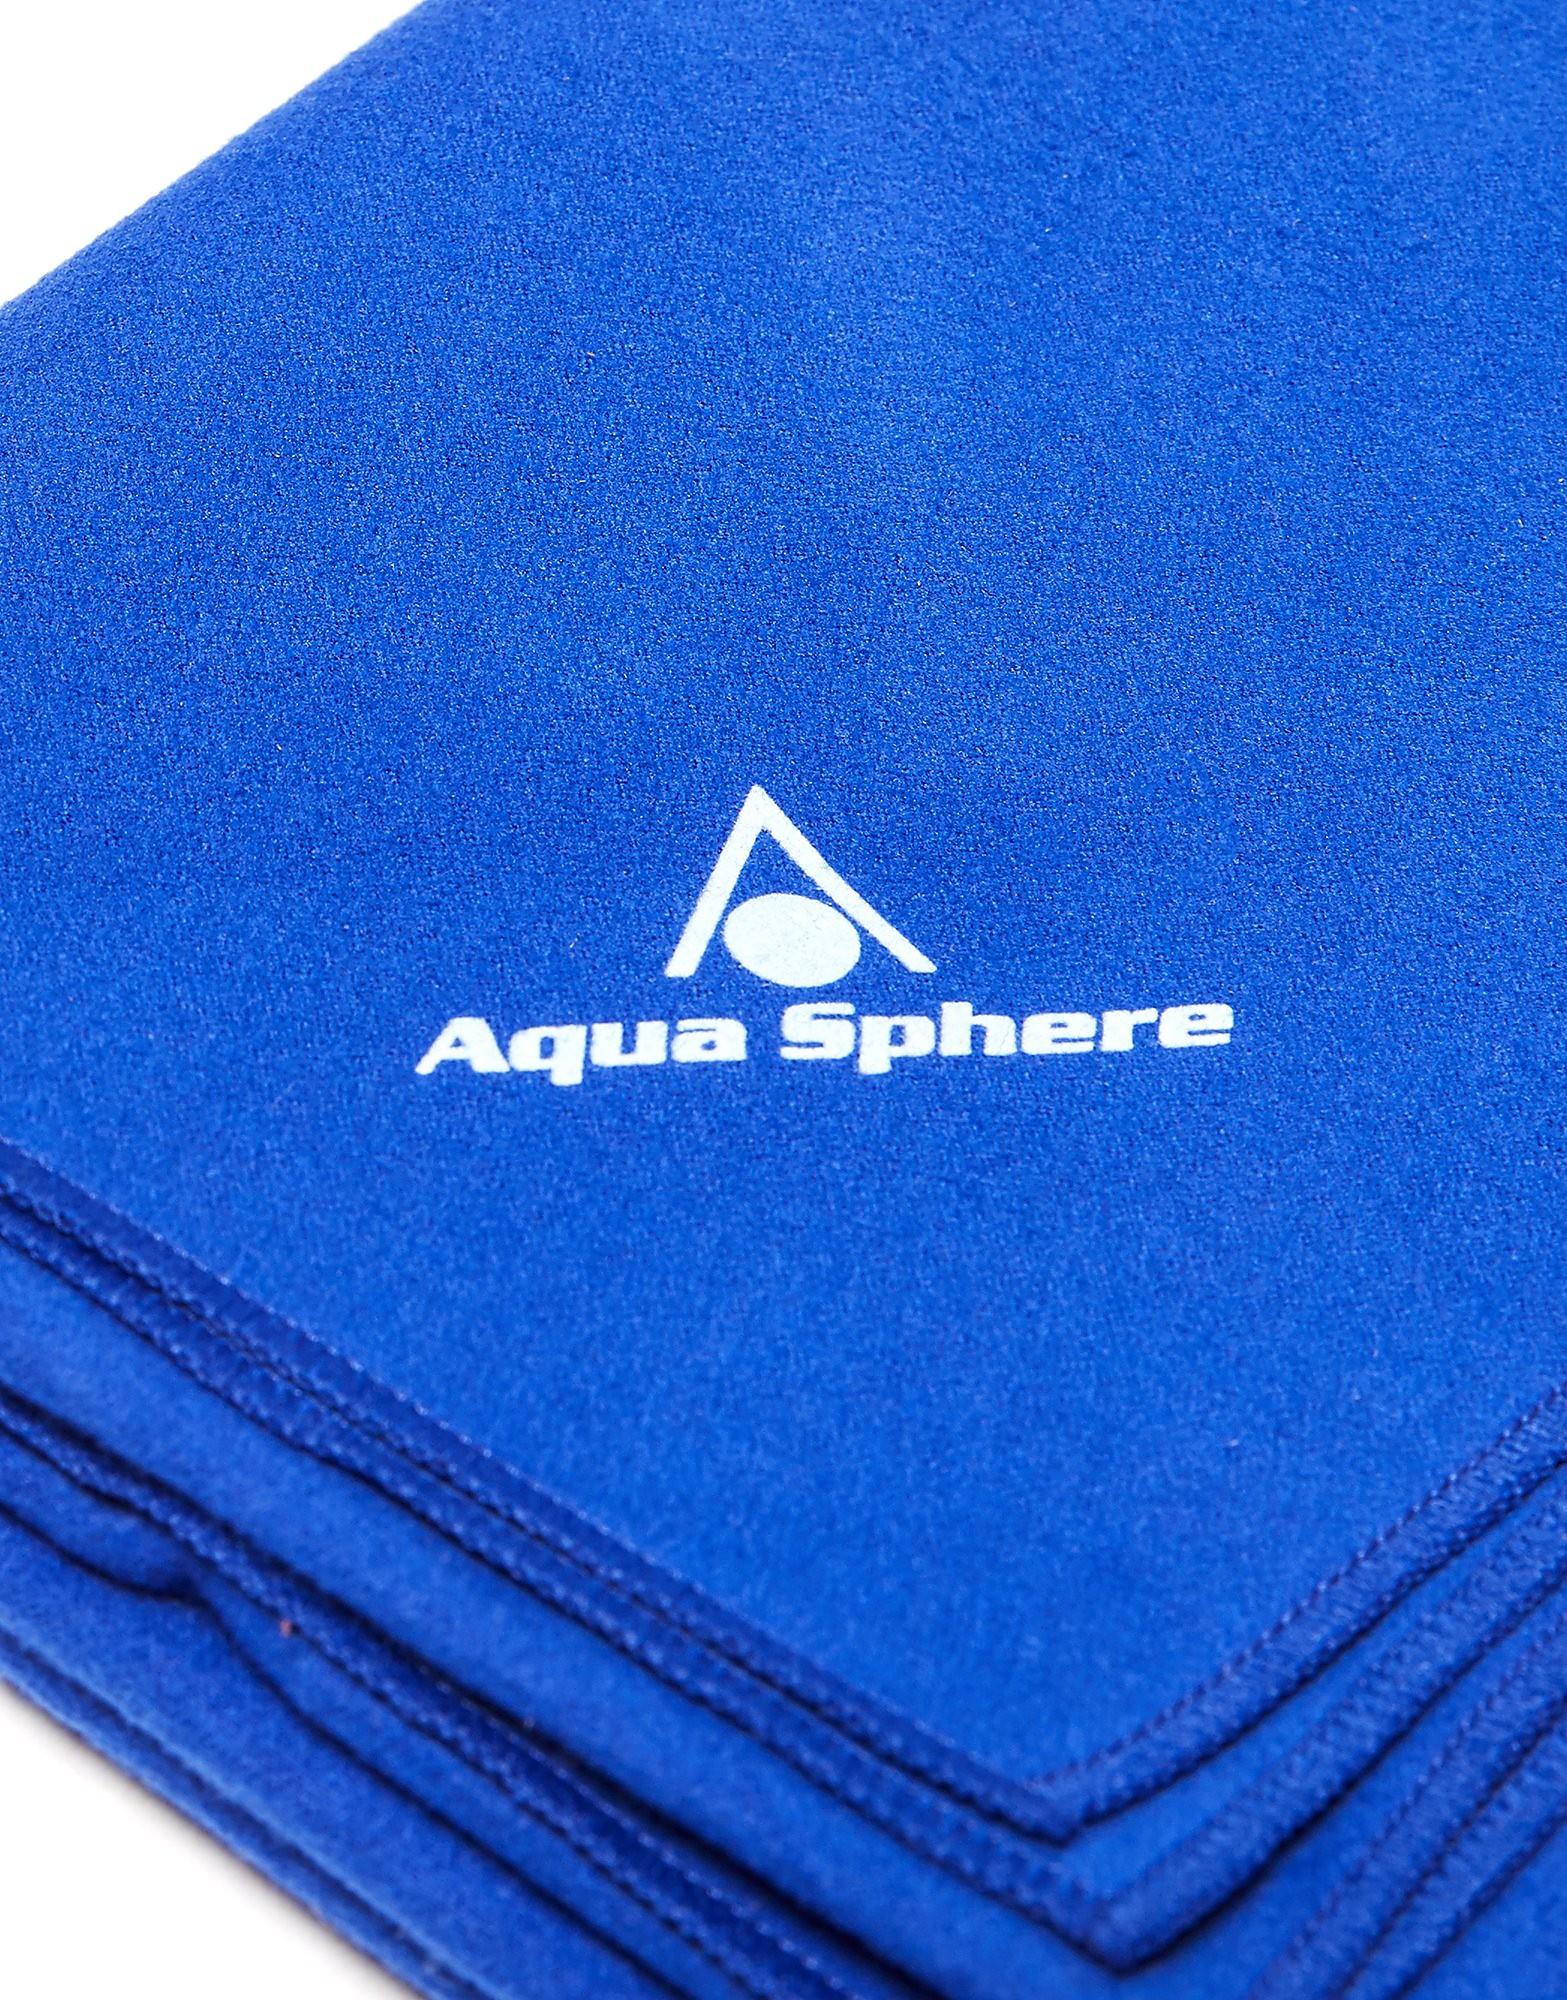 Aqua Sphere Swimmer's Dry Towel